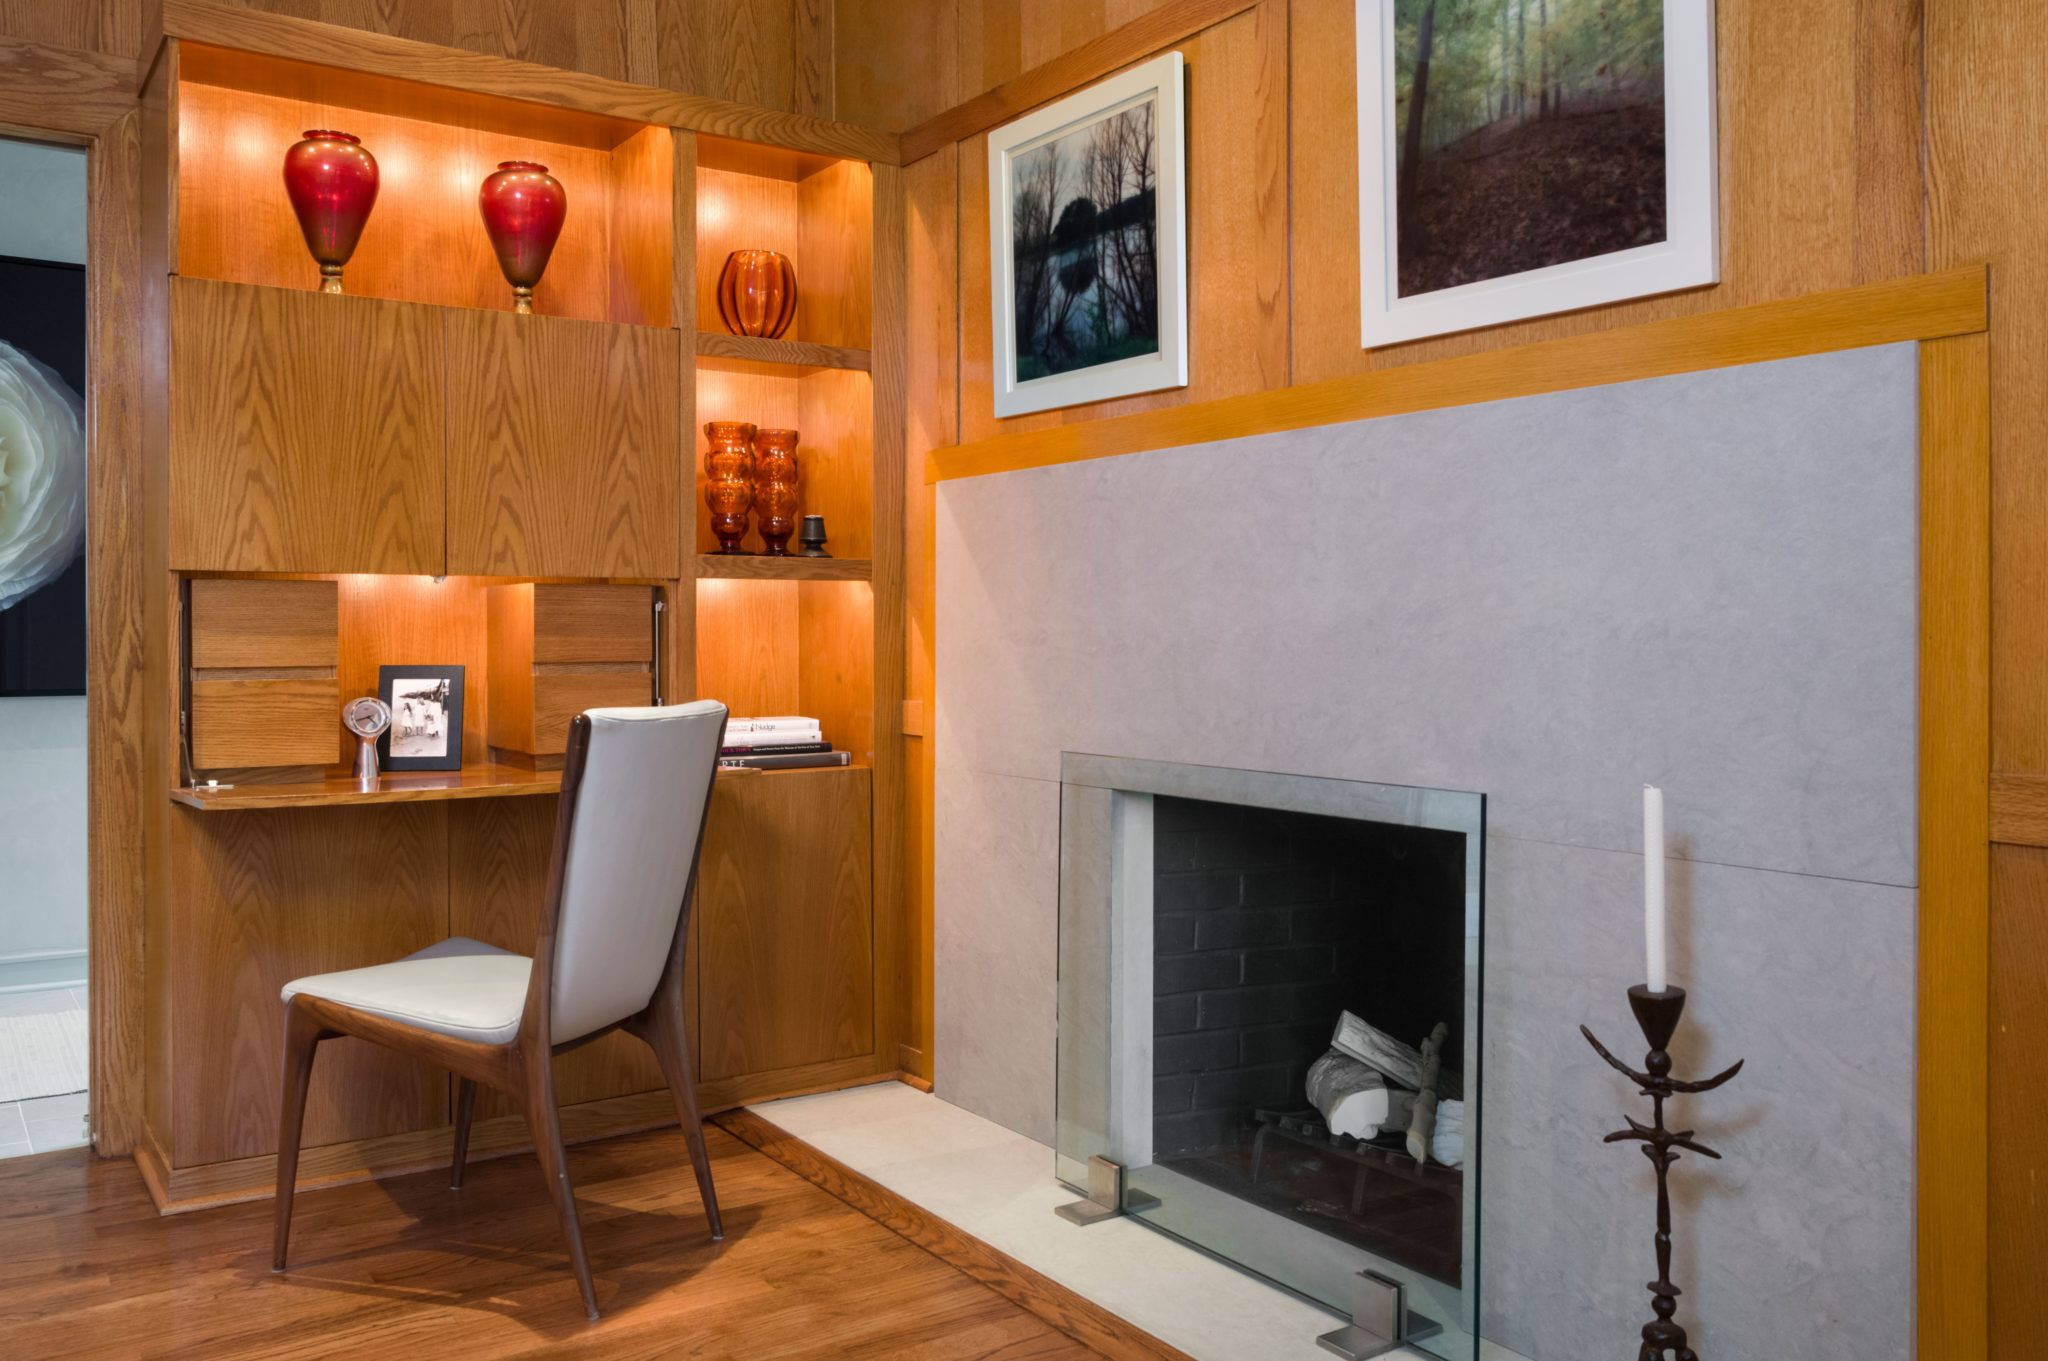 Thackery Lane Residence - Mendham, NJ by LKID